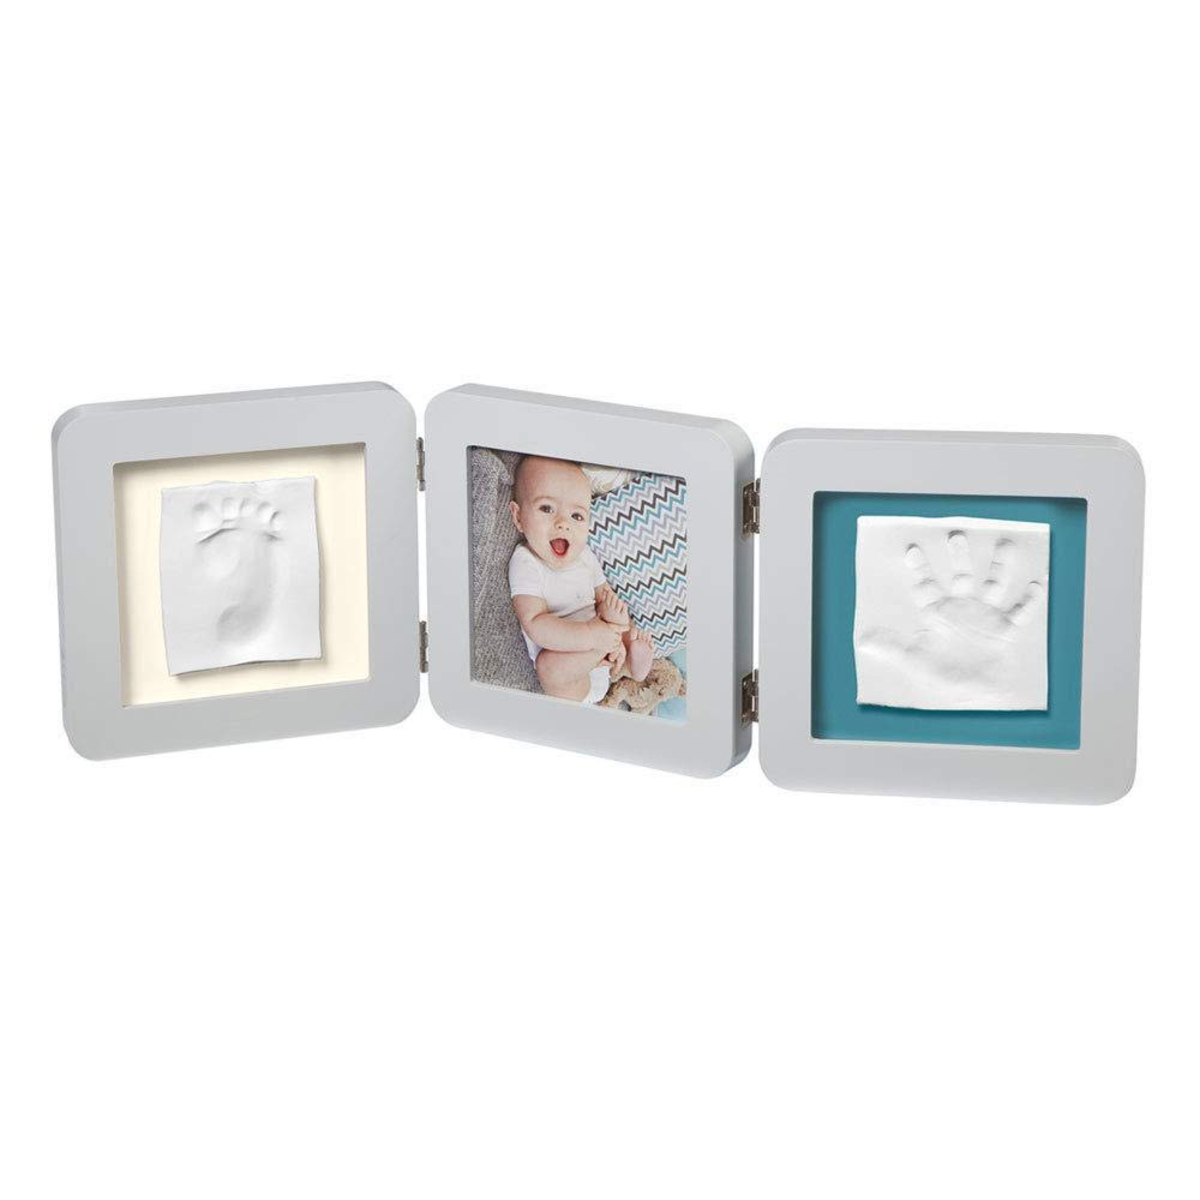 Empreinte & Moulage Kit d'Empreinte My Baby Touch Double - Pastel Kit d'Empreinte My Baby Touch Double - Pastel